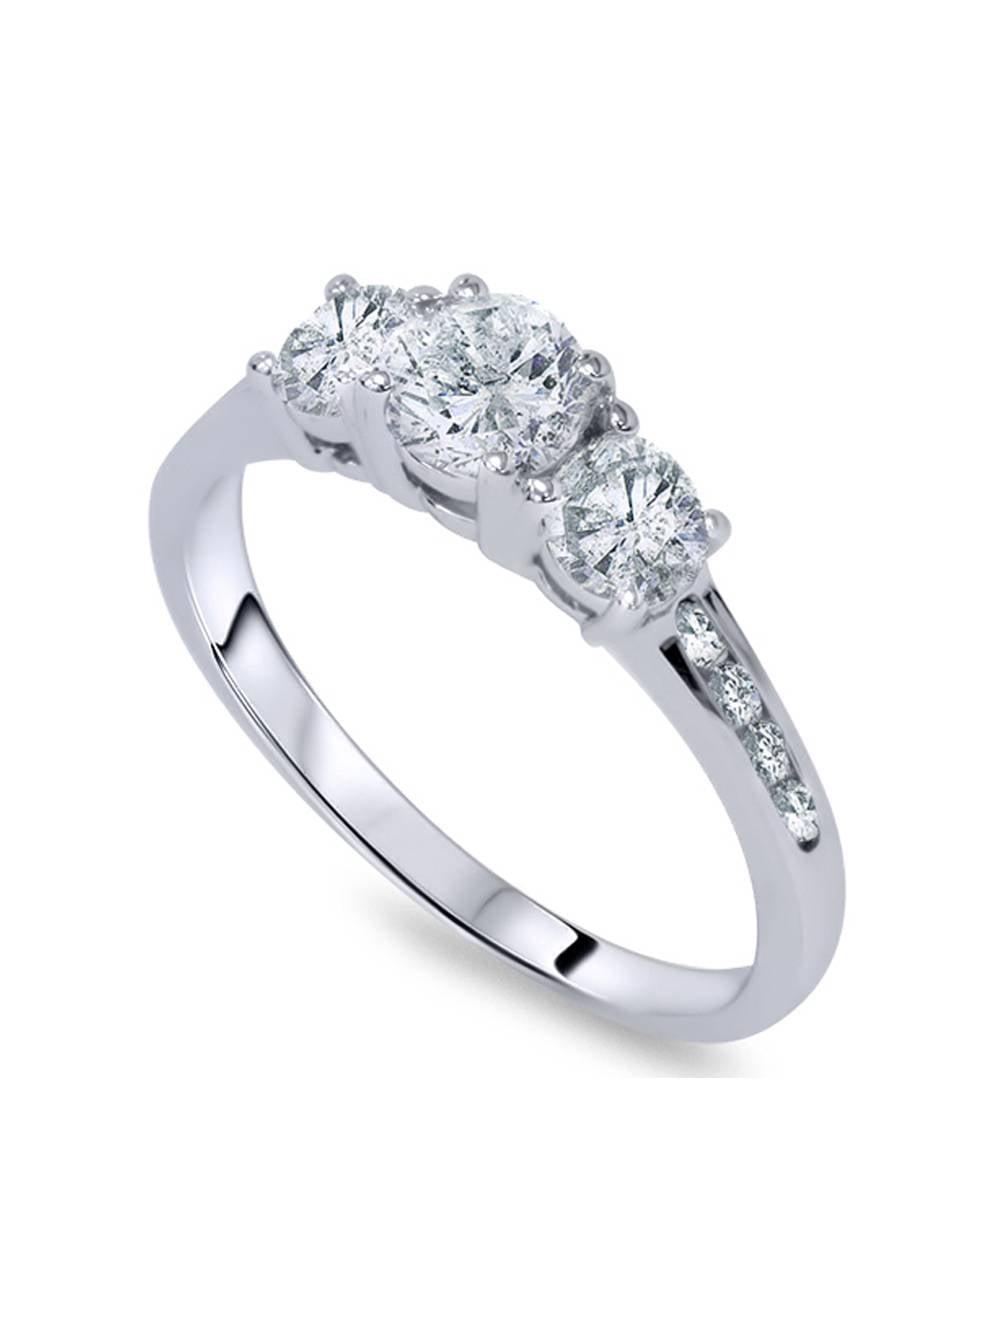 1ct Three Stone Diamond Engagement Ring 14K White Gold by Pompeii3